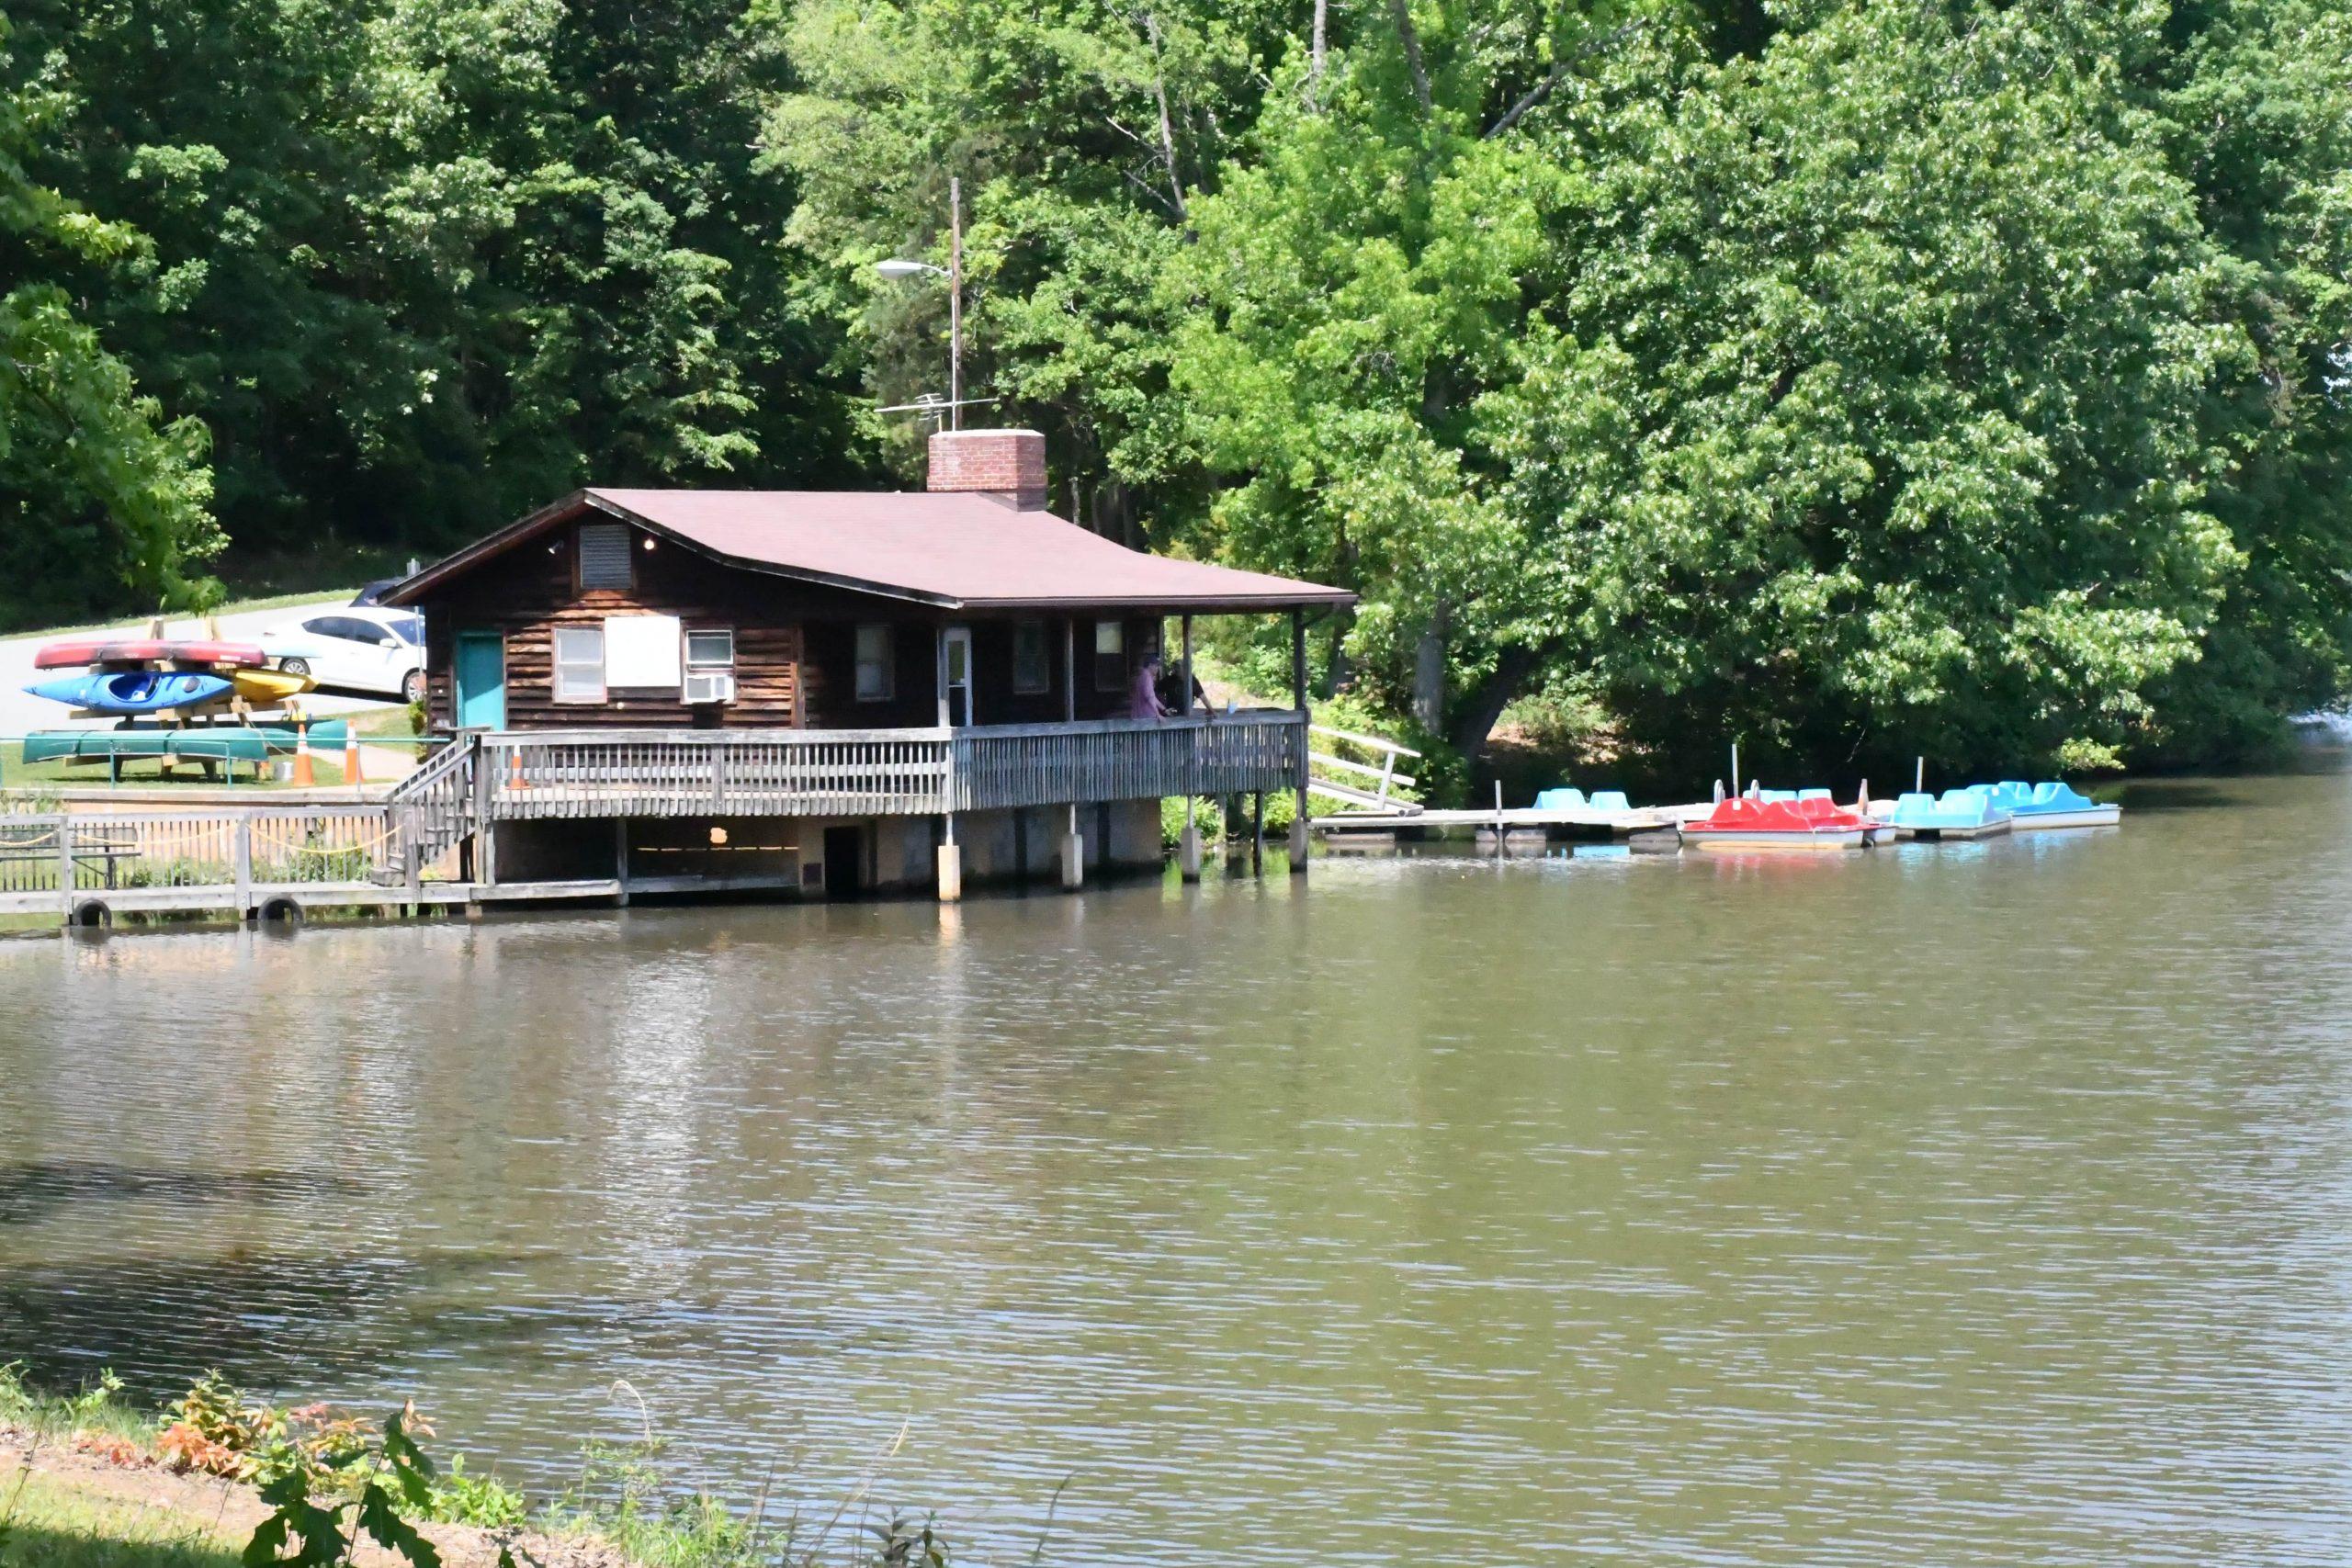 Lake Michael boat house